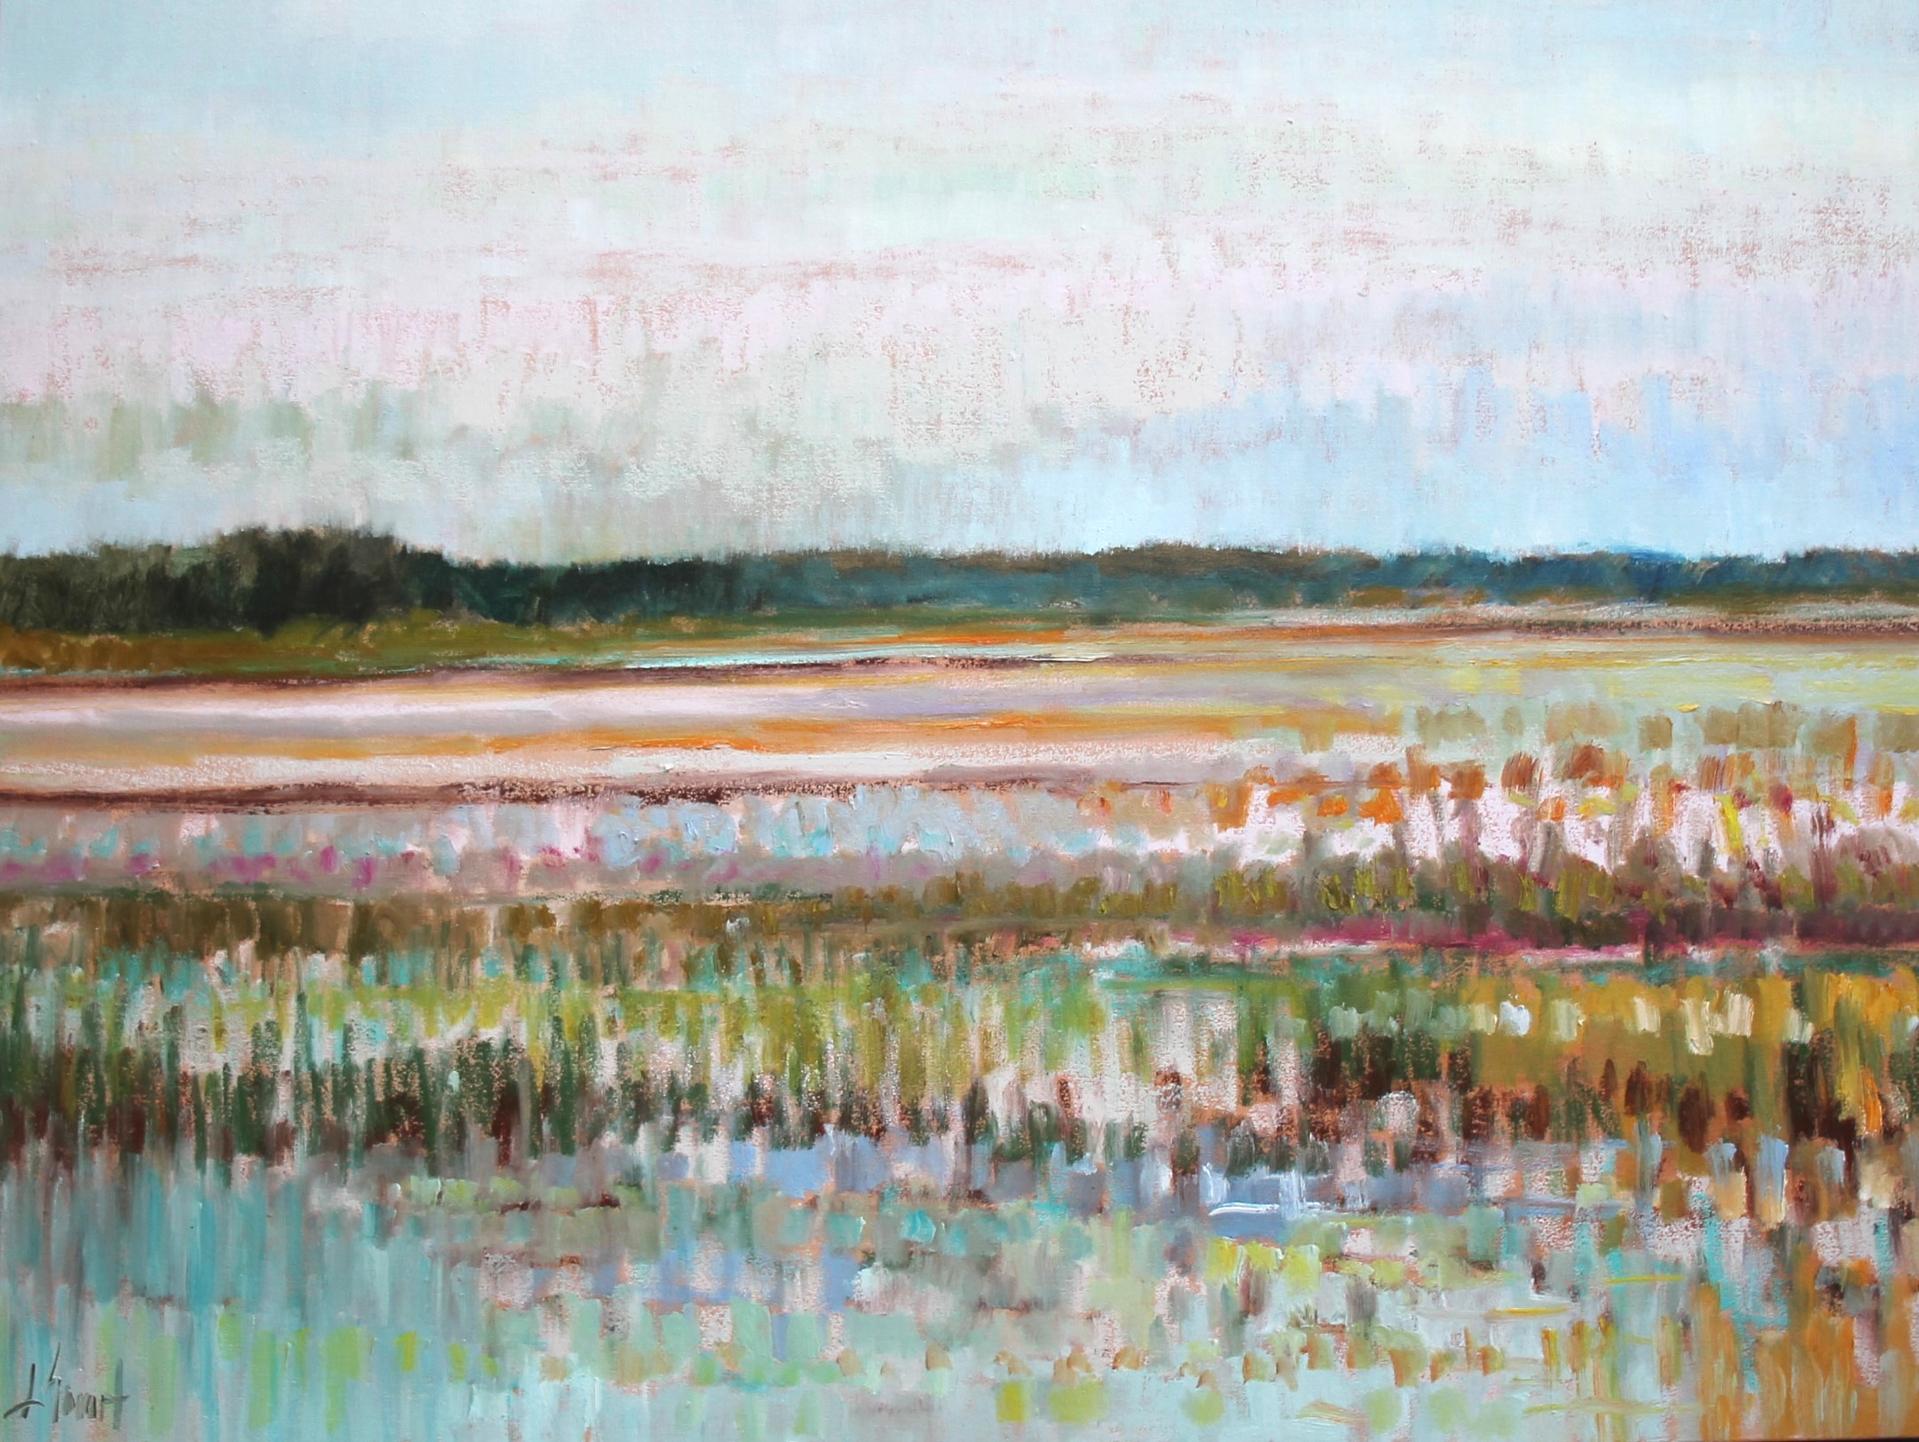 Salt Marsh View by Libby Smart